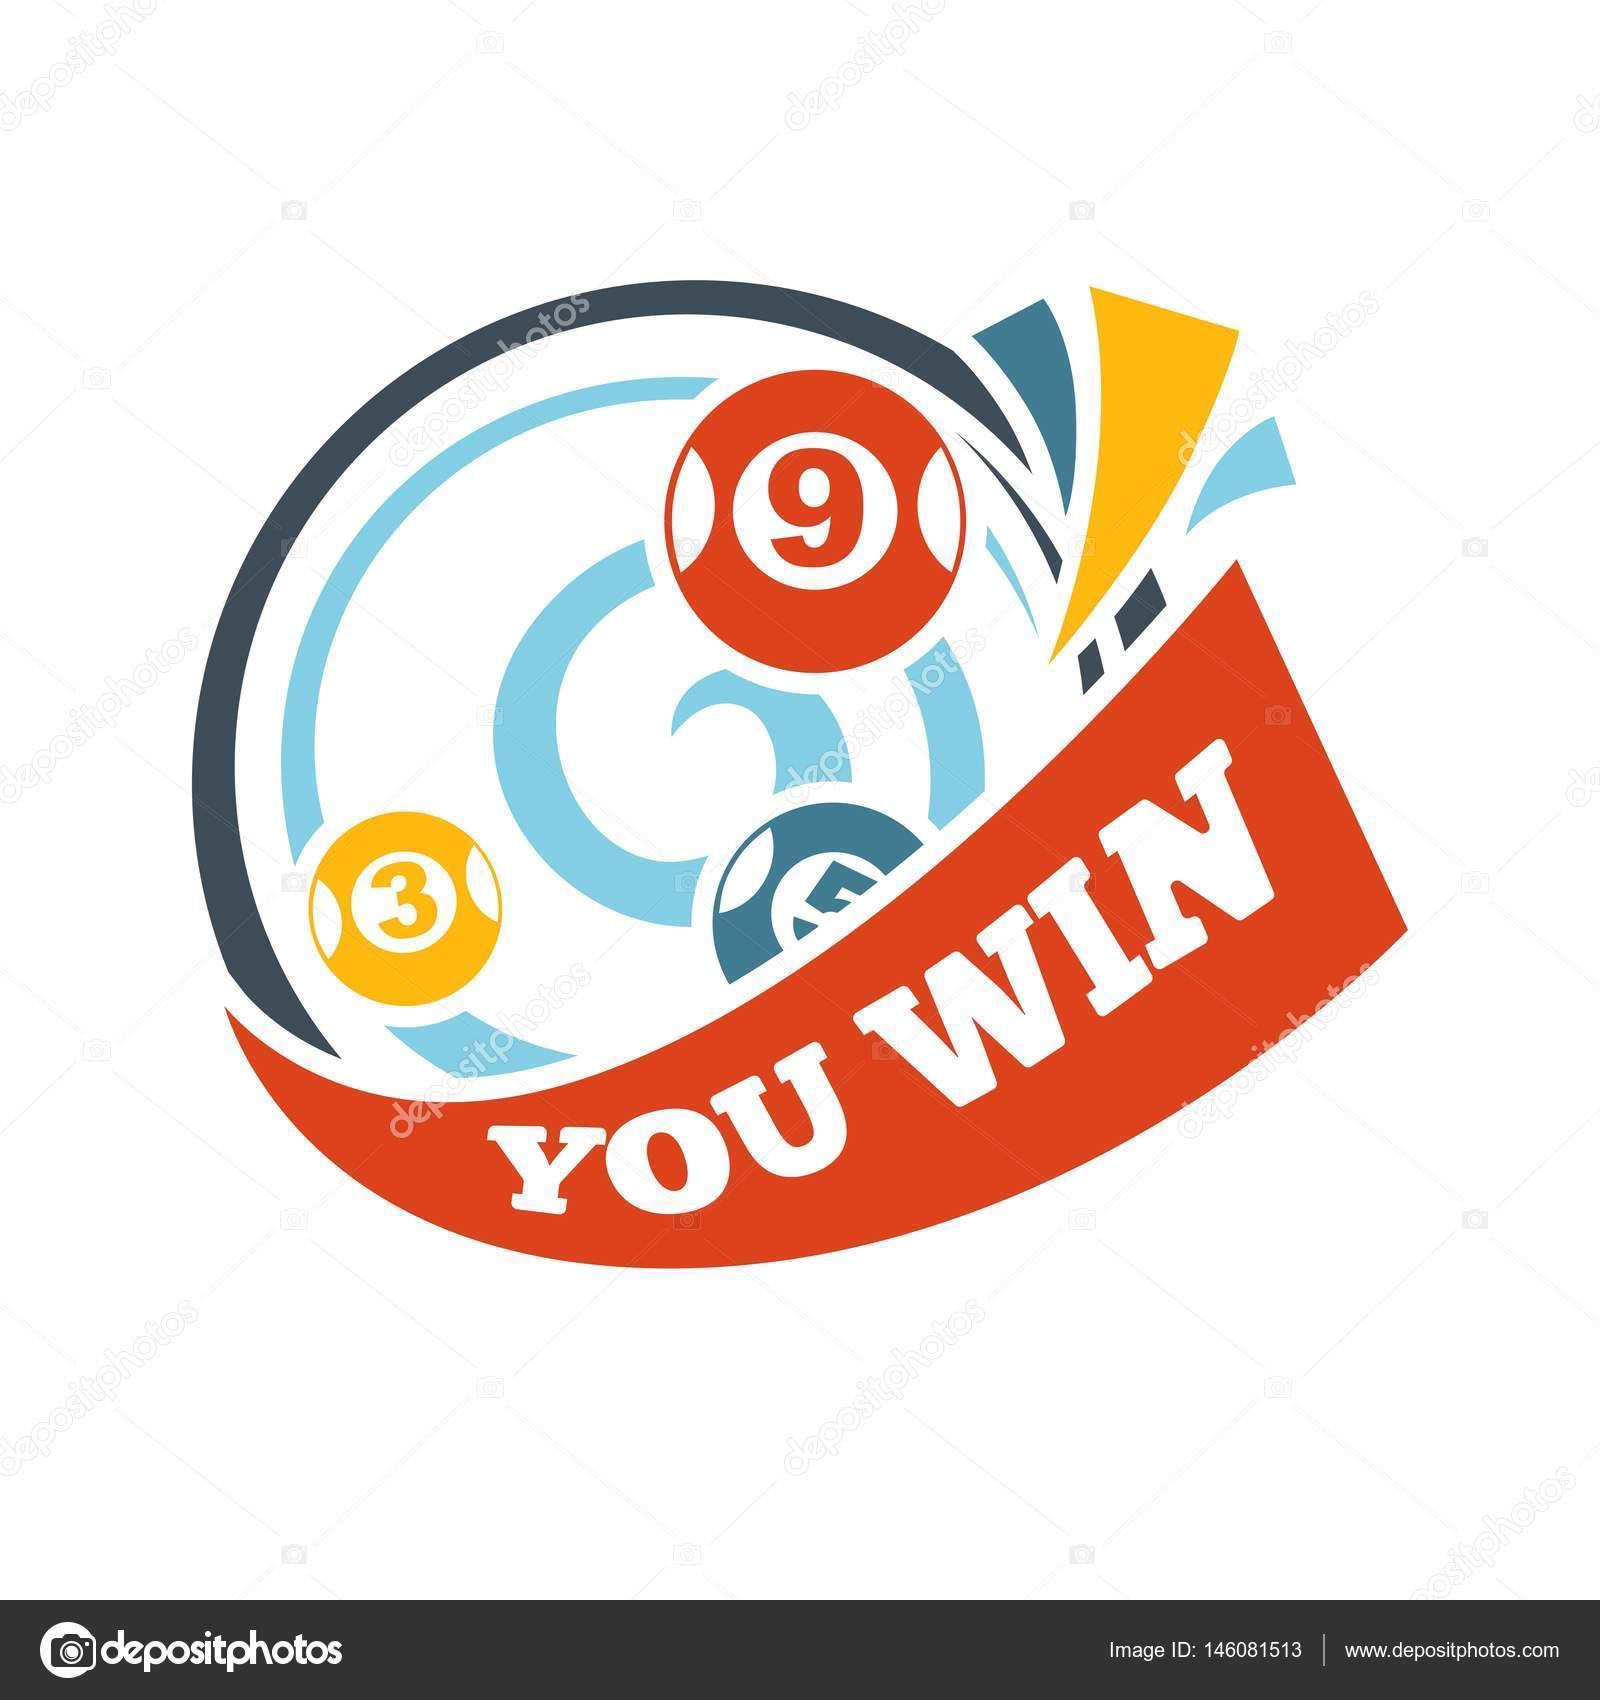 Logo de Lotería Bingo lotto — Vector de stock © Sonulkaster #146081513